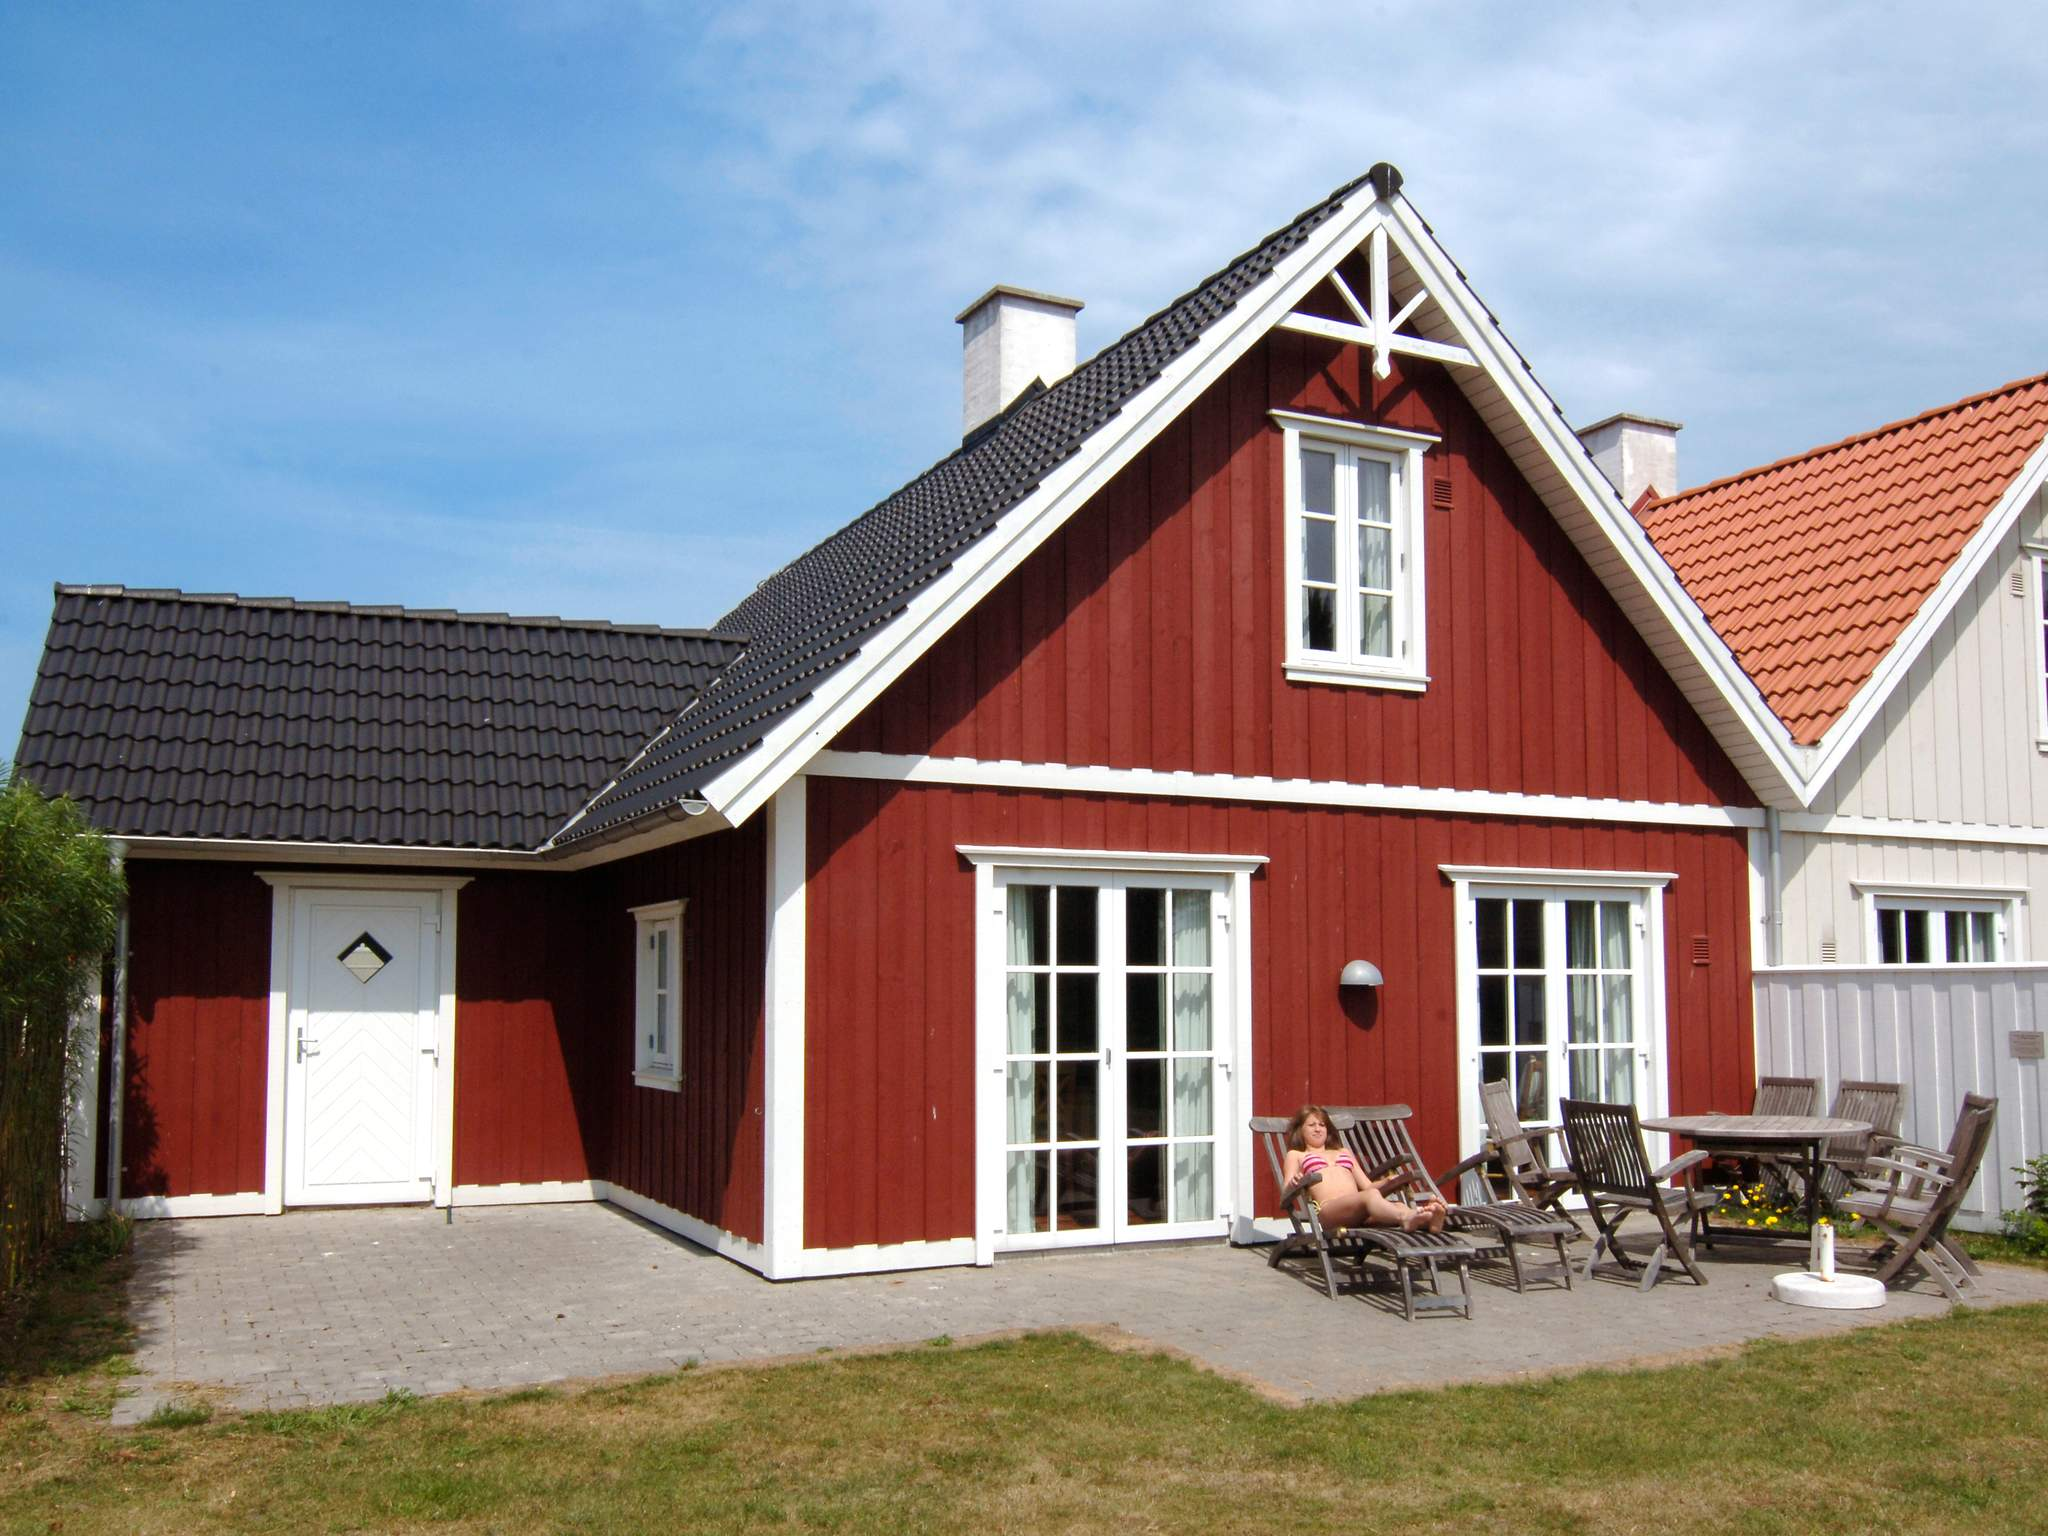 Ferienhaus Blåvand (241666), Blåvand, , Westjütland, Dänemark, Bild 1